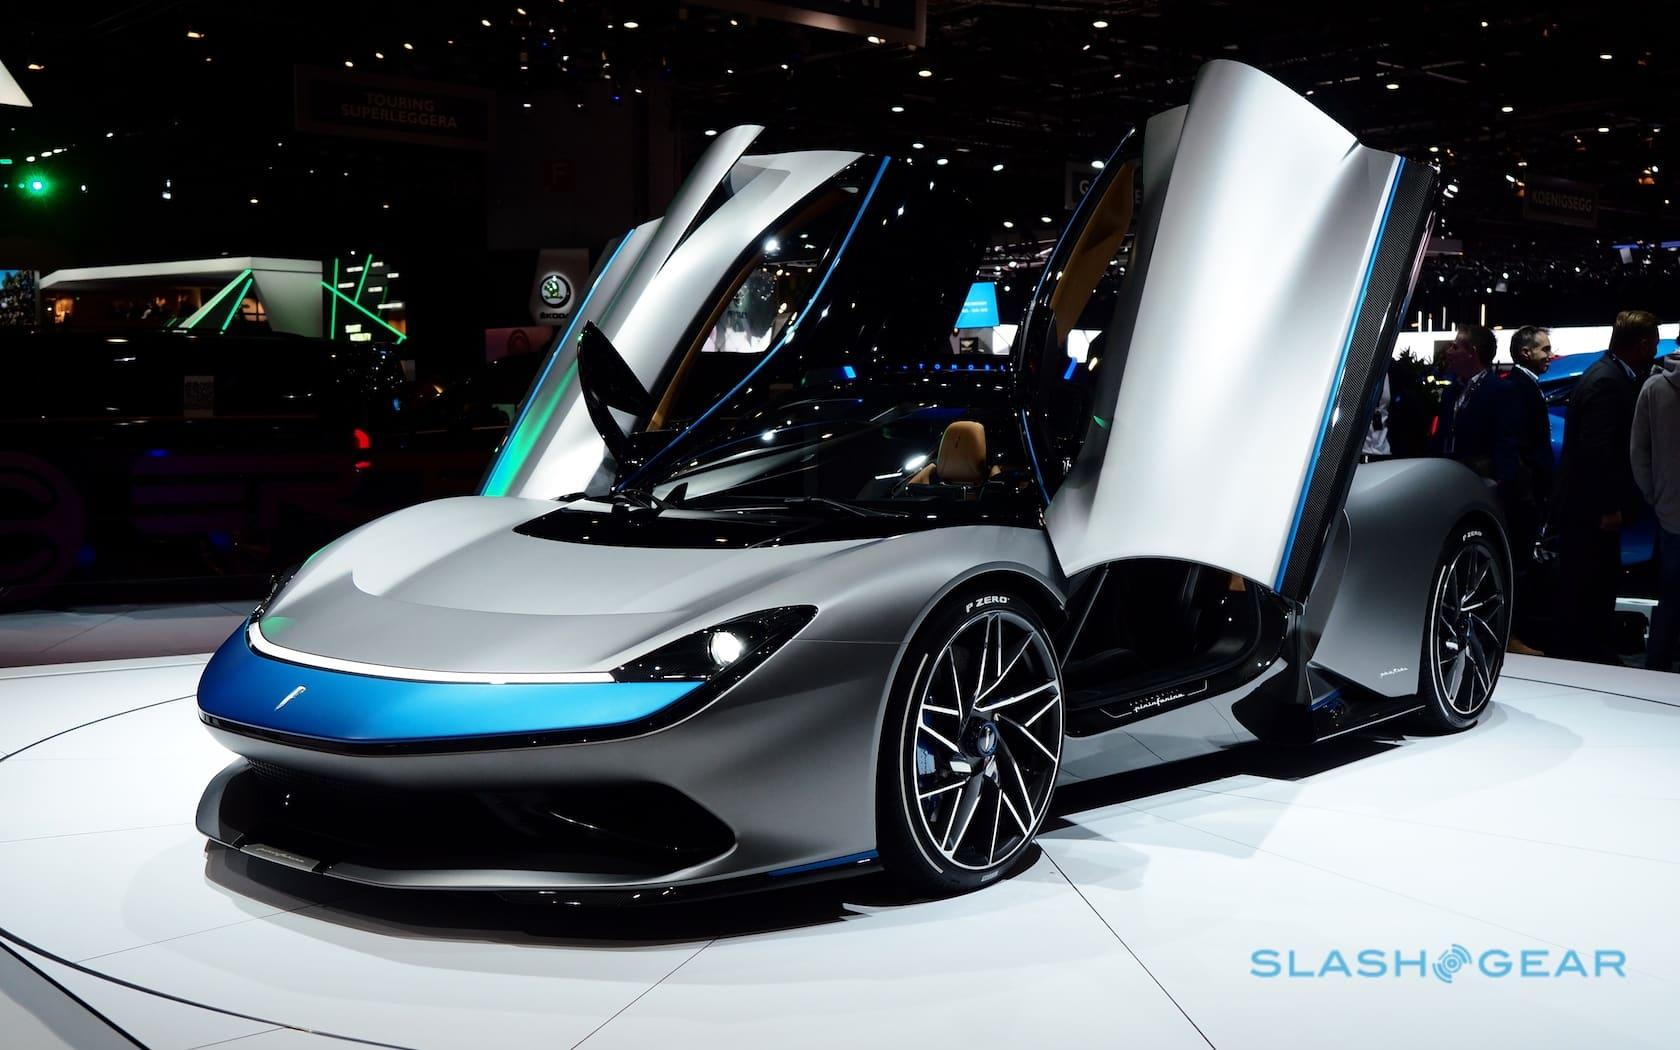 Pininfarina Battista 1 900hp Electric Hypercar Is Outrageous Slashgear